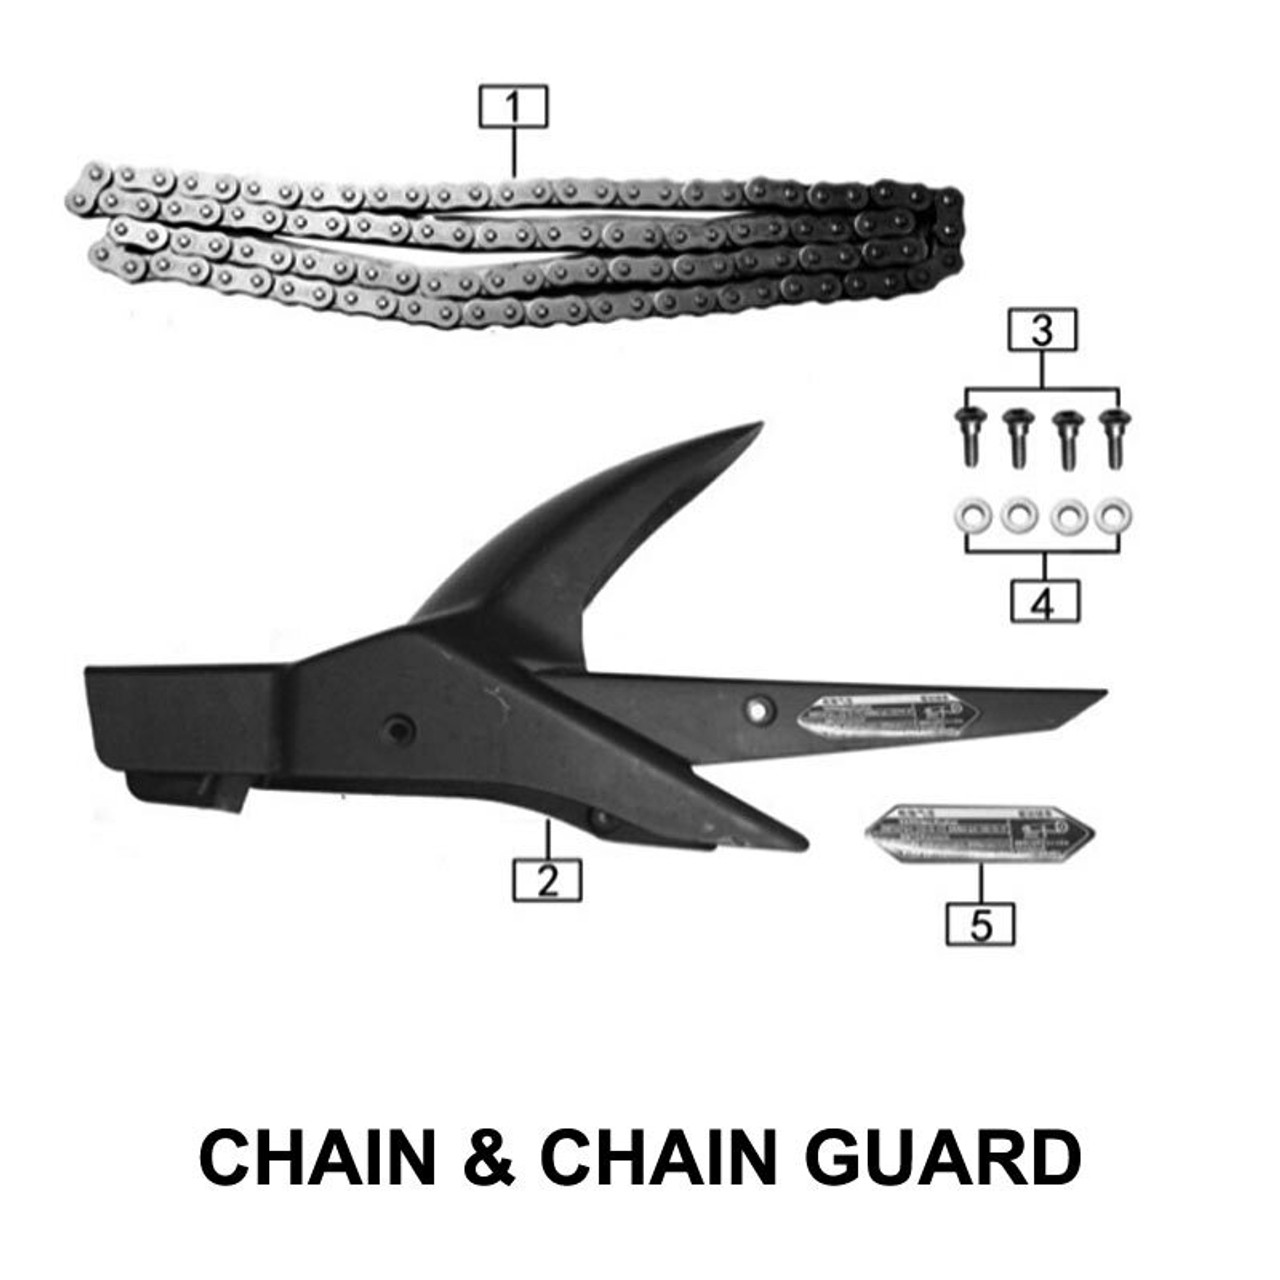 CHAIN & CHAIN GUARD